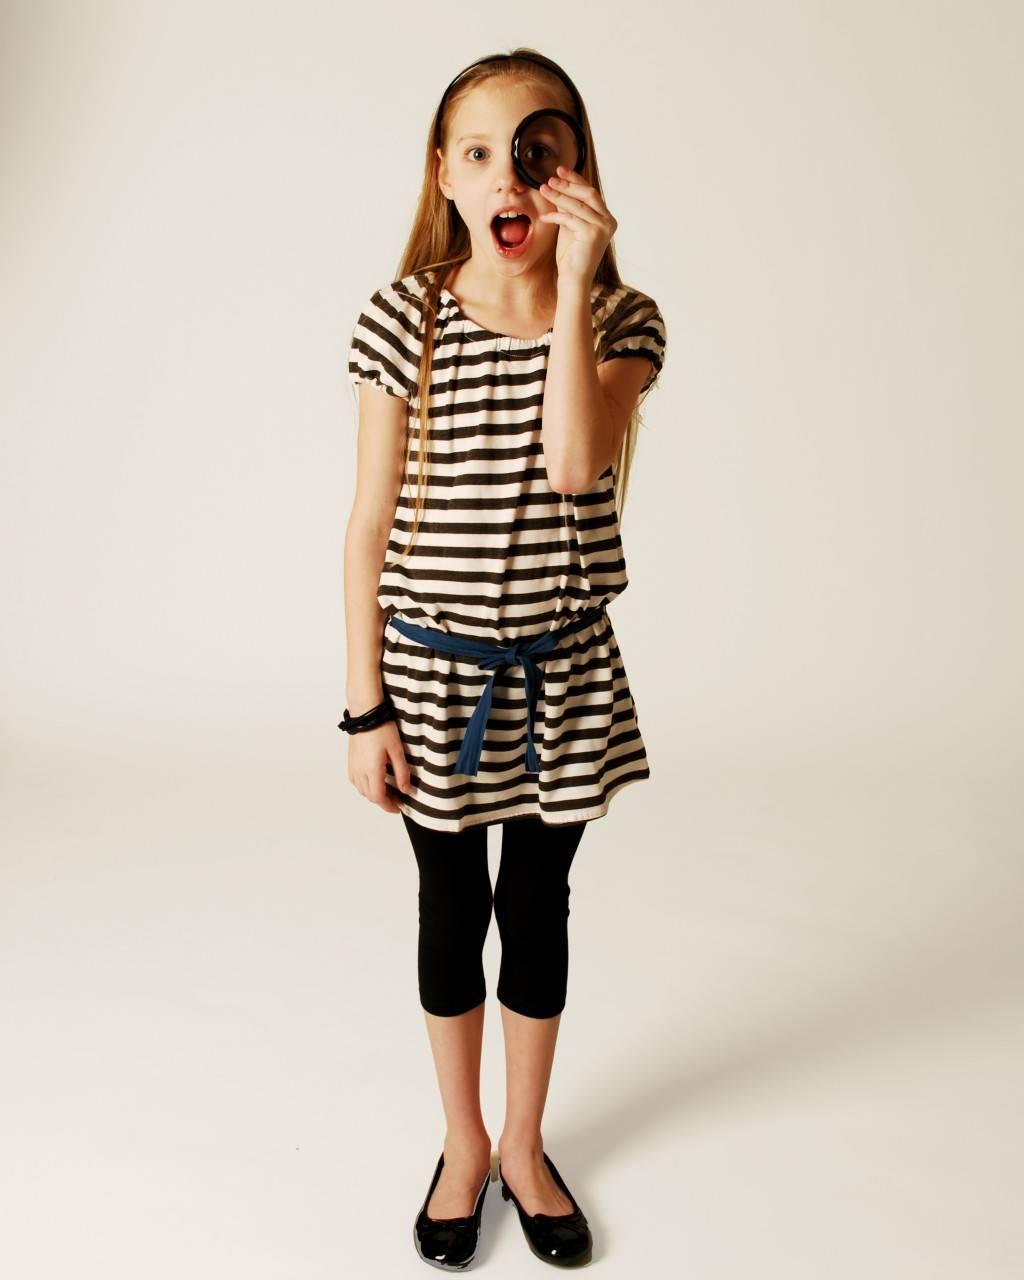 Kids urban clothing stores online